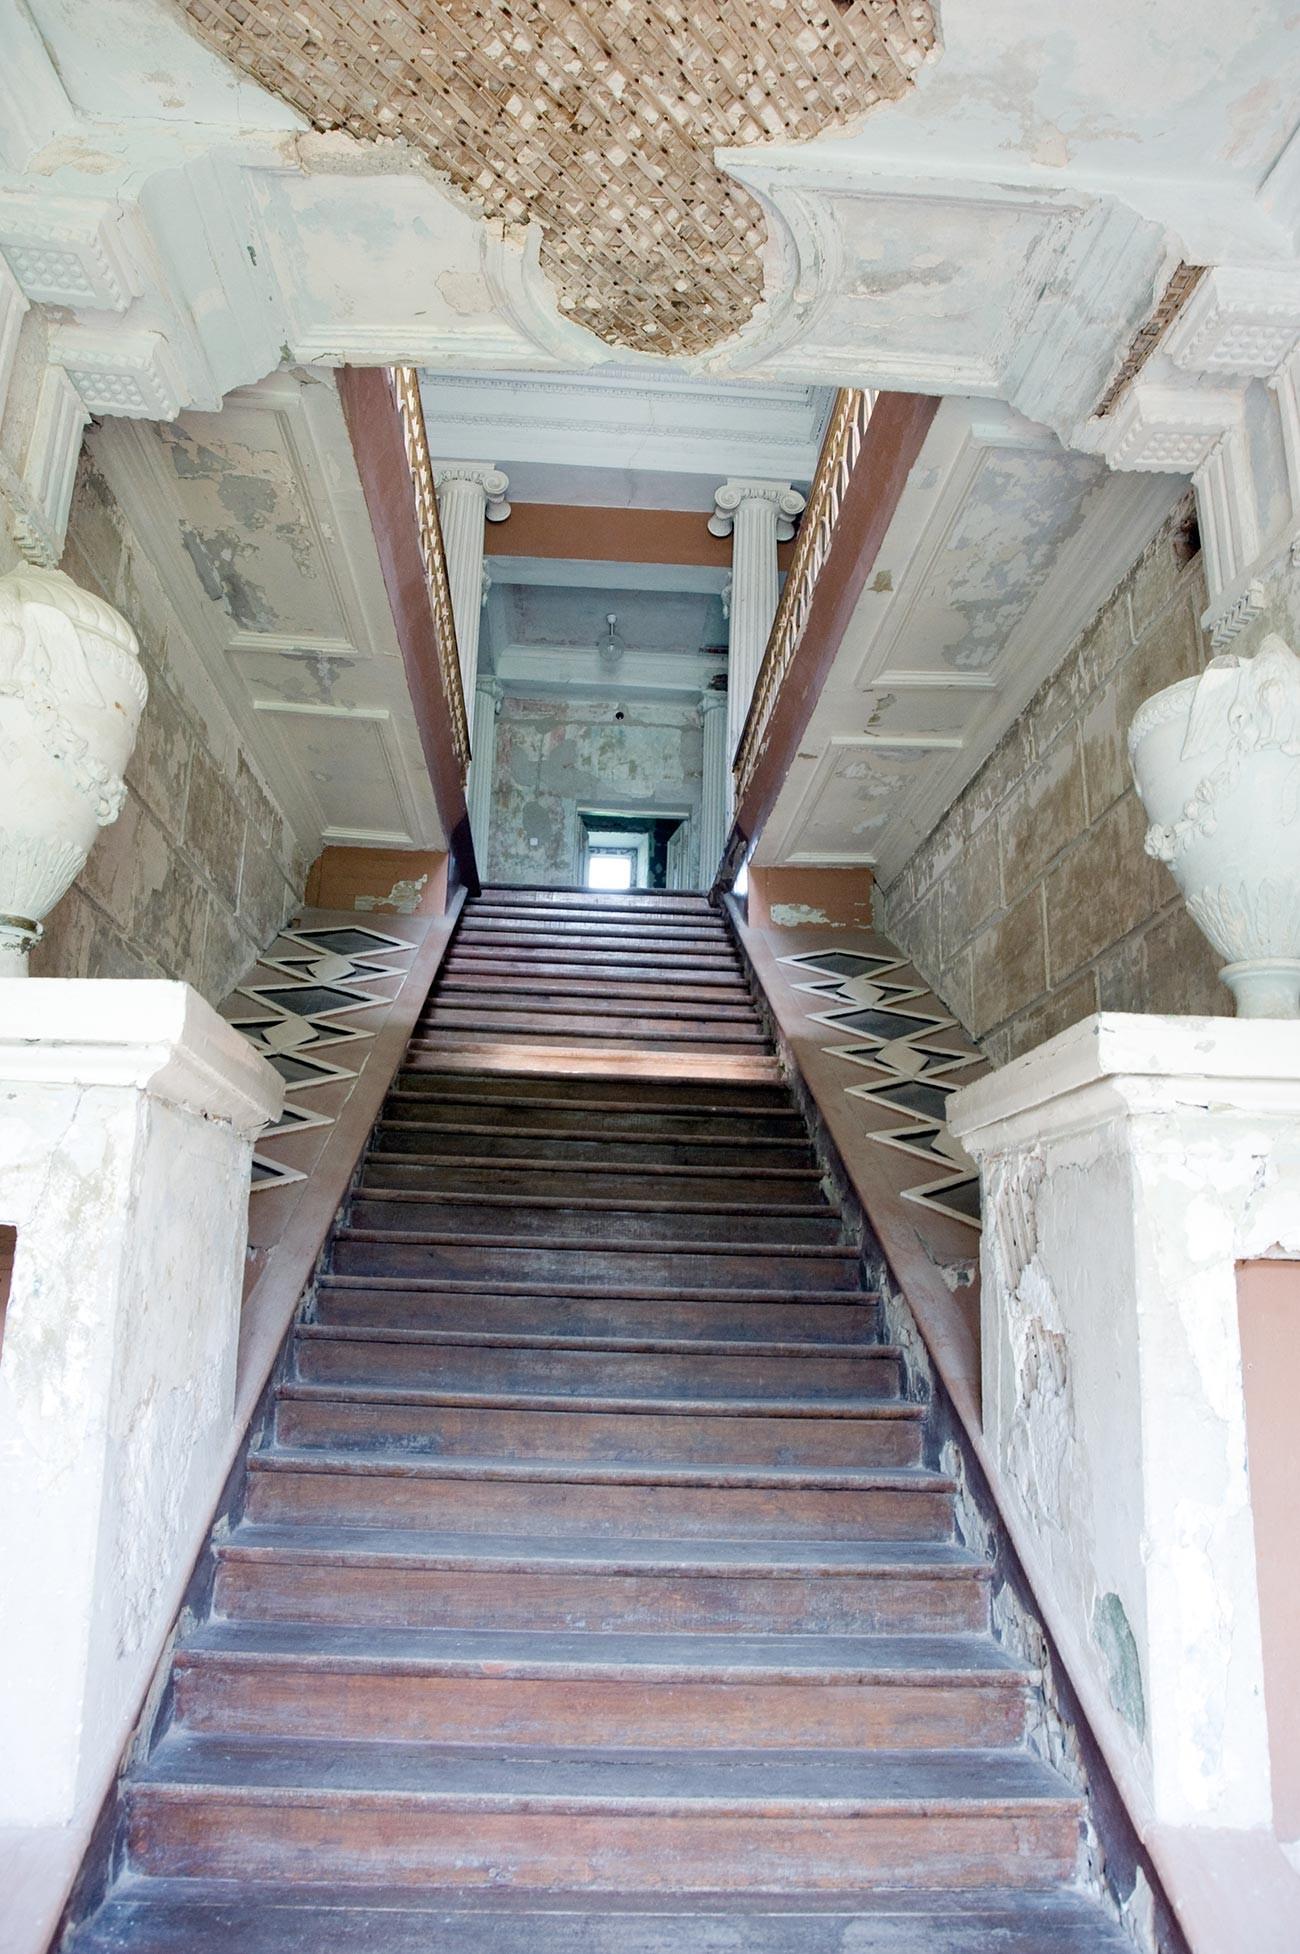 Znamenskoïe-Raïok. Intérieur du château. Grande salle avec dôme